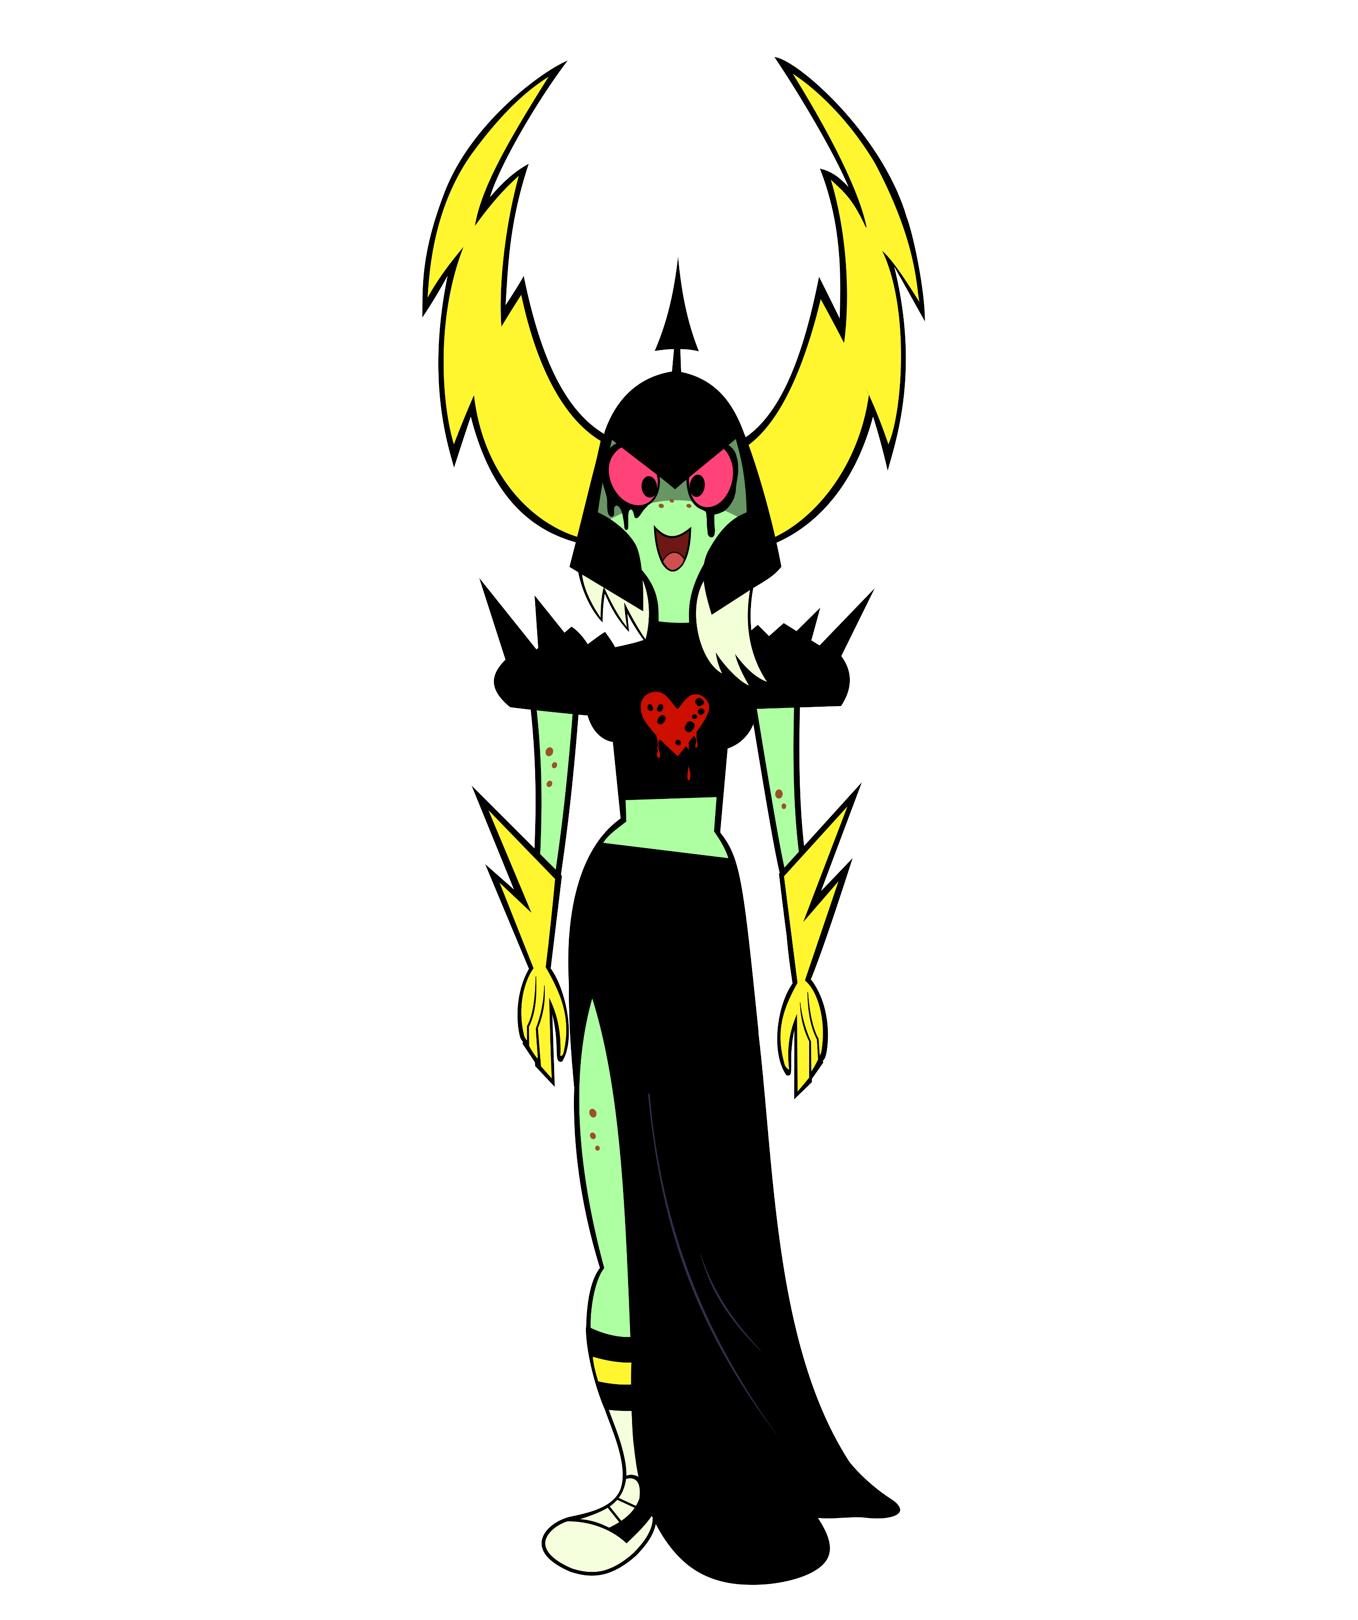 Lord Dominator